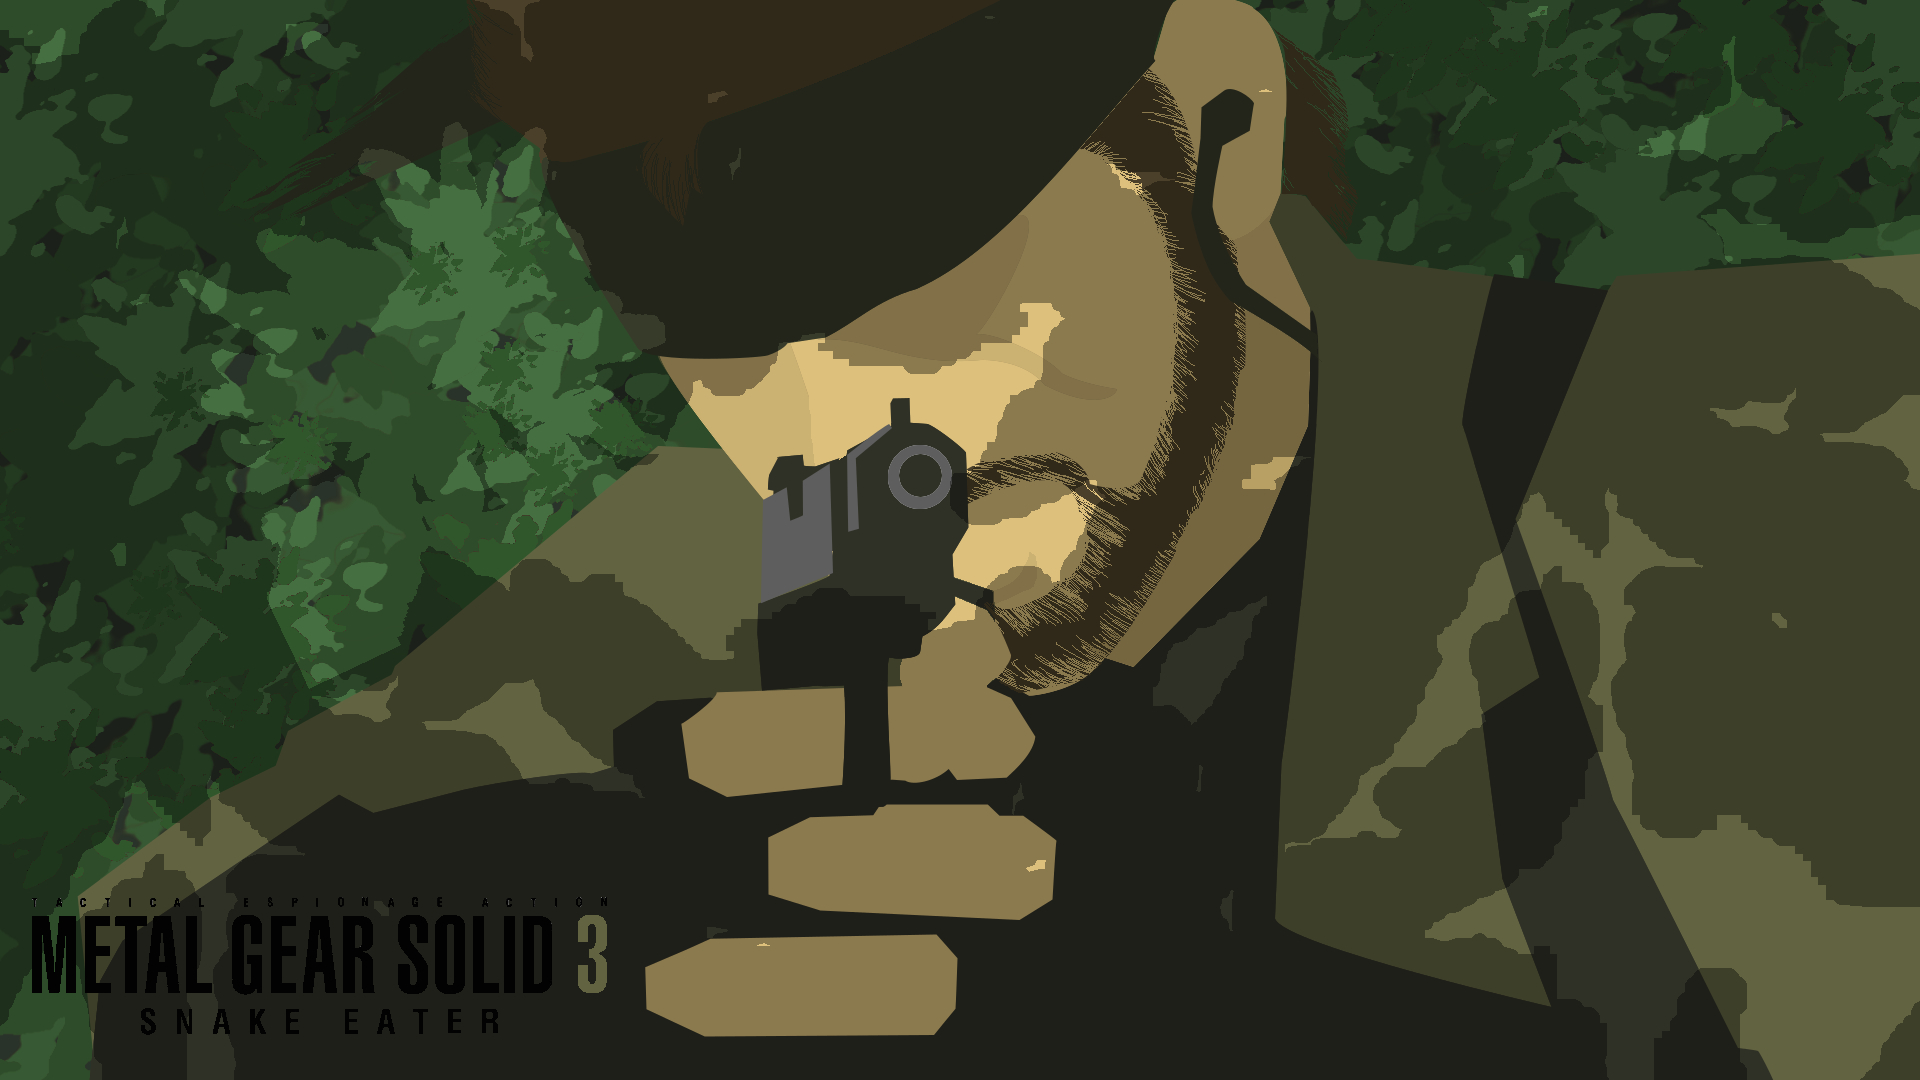 Metal Gear Solid Minimalist Wallpaper 1 By Bobby Boberman On